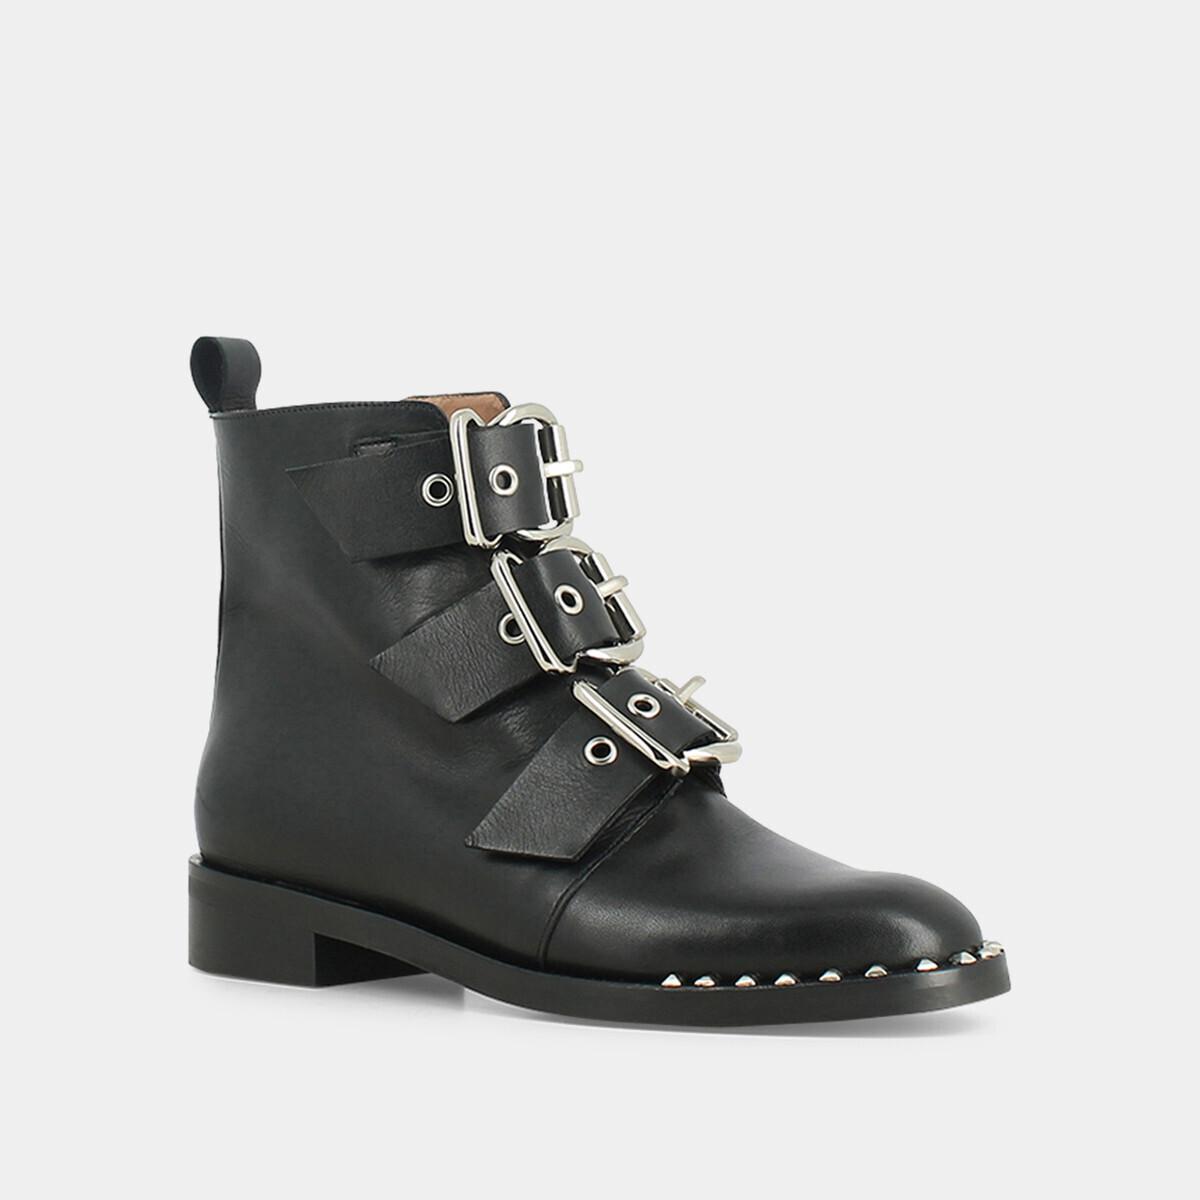 JonakDIRCE - Cowboy/Biker boots - noir pKVgKL